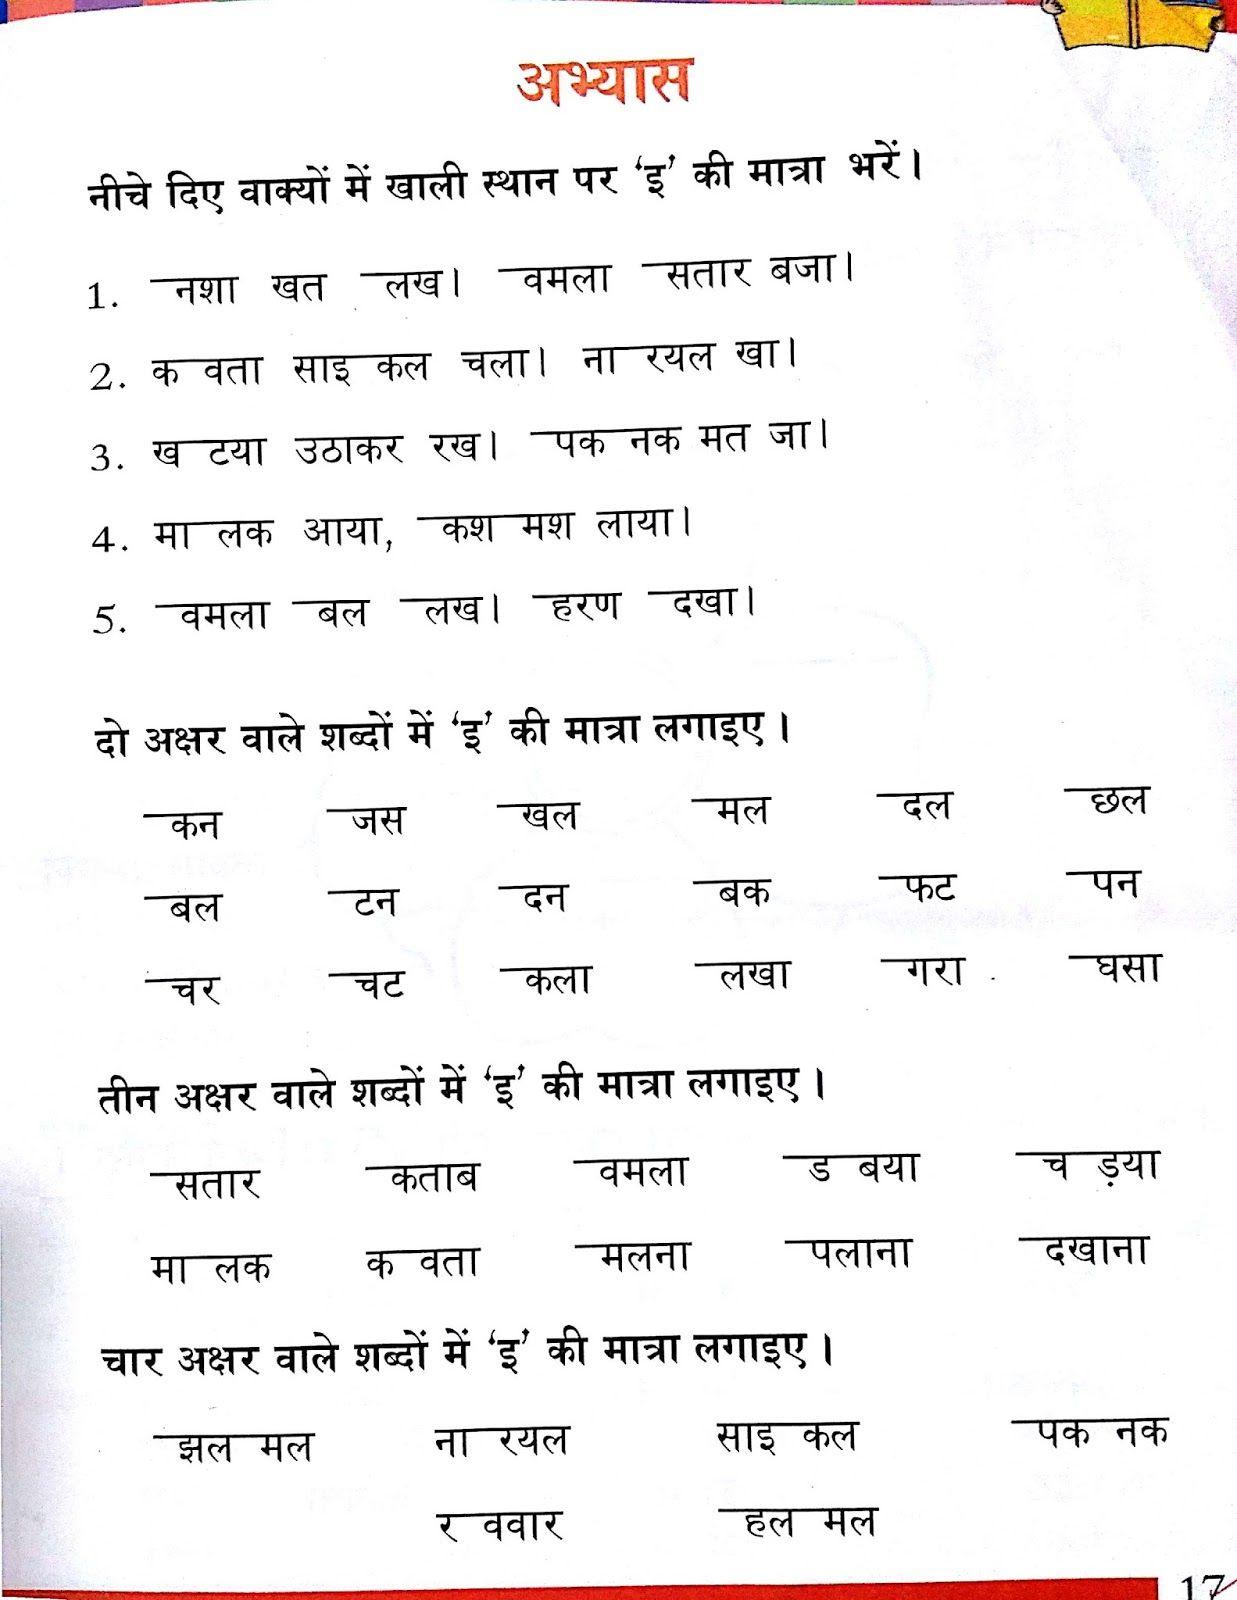 Hindi Worksheets Hindi Language Learning Learn Hindi [ 1600 x 1237 Pixel ]